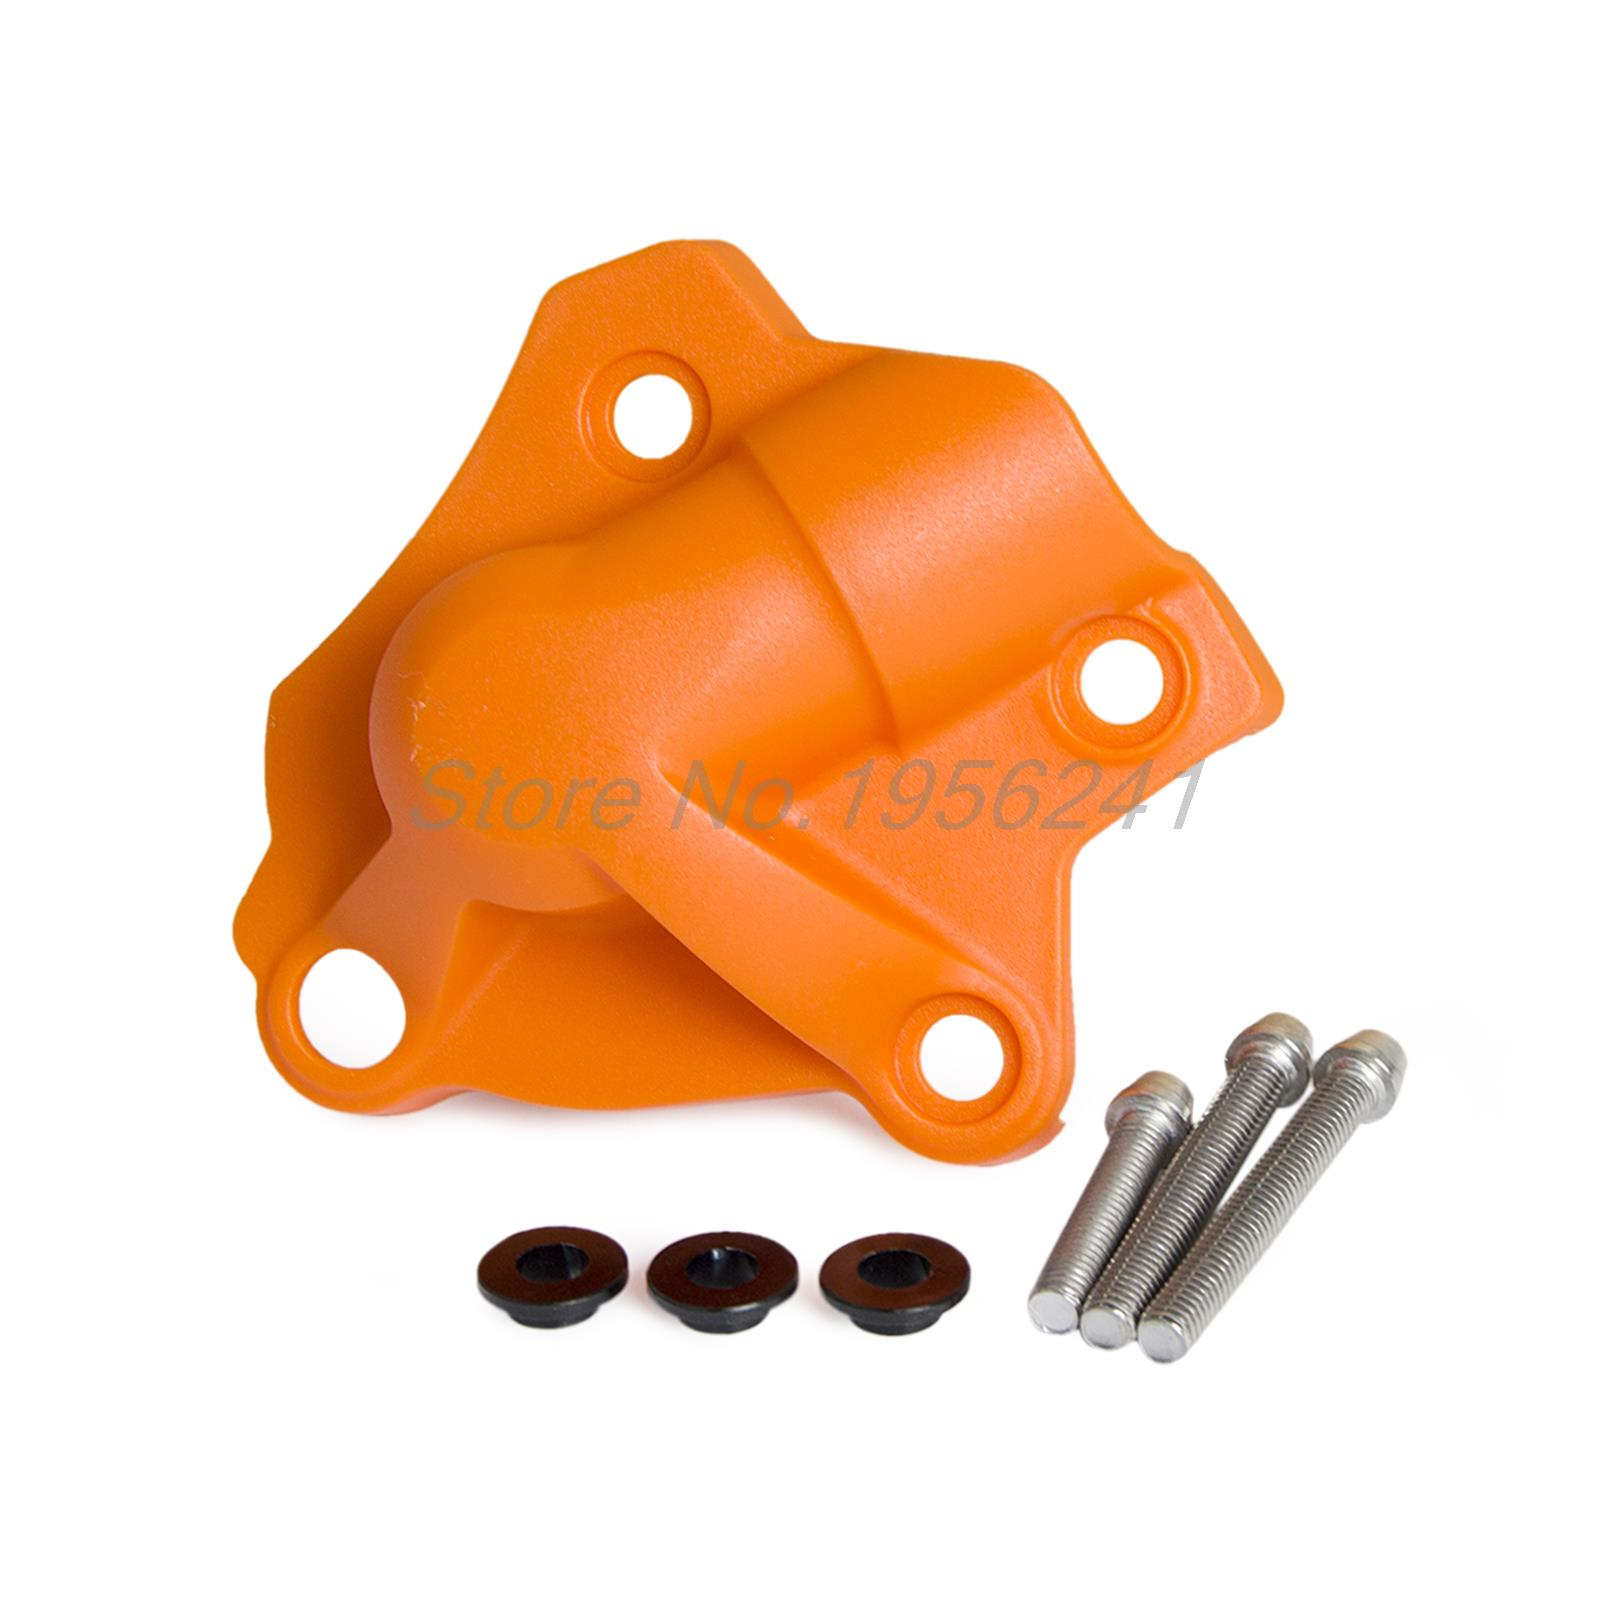 Exhaust Gasket BLG39 Klarius 068251235 GEX7696 5854988 854936 854937 Quality New